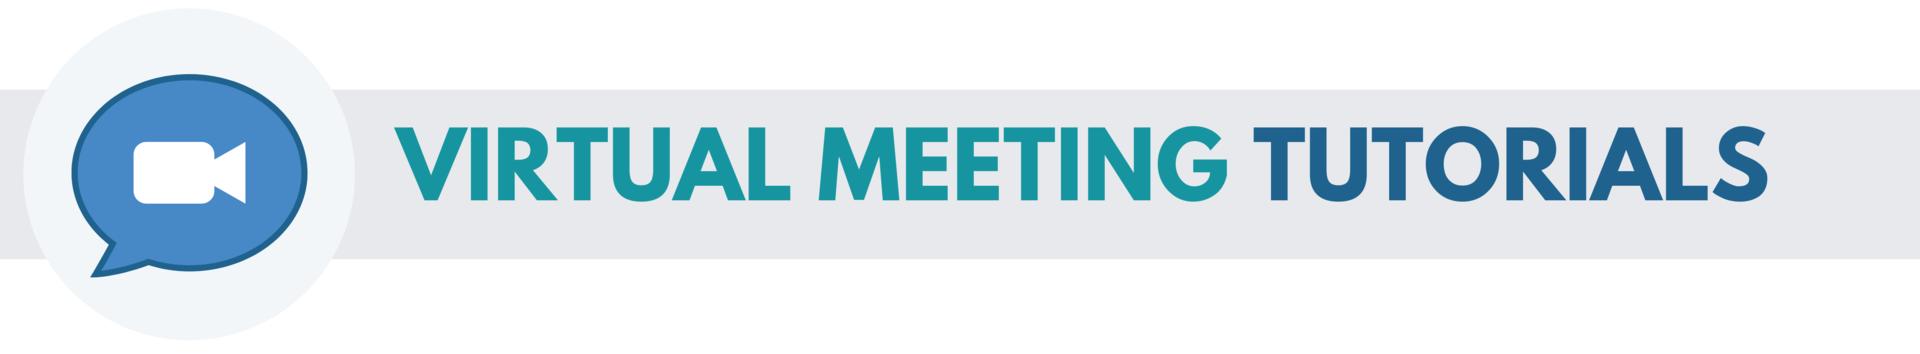 Virtual Meeting Tutorials